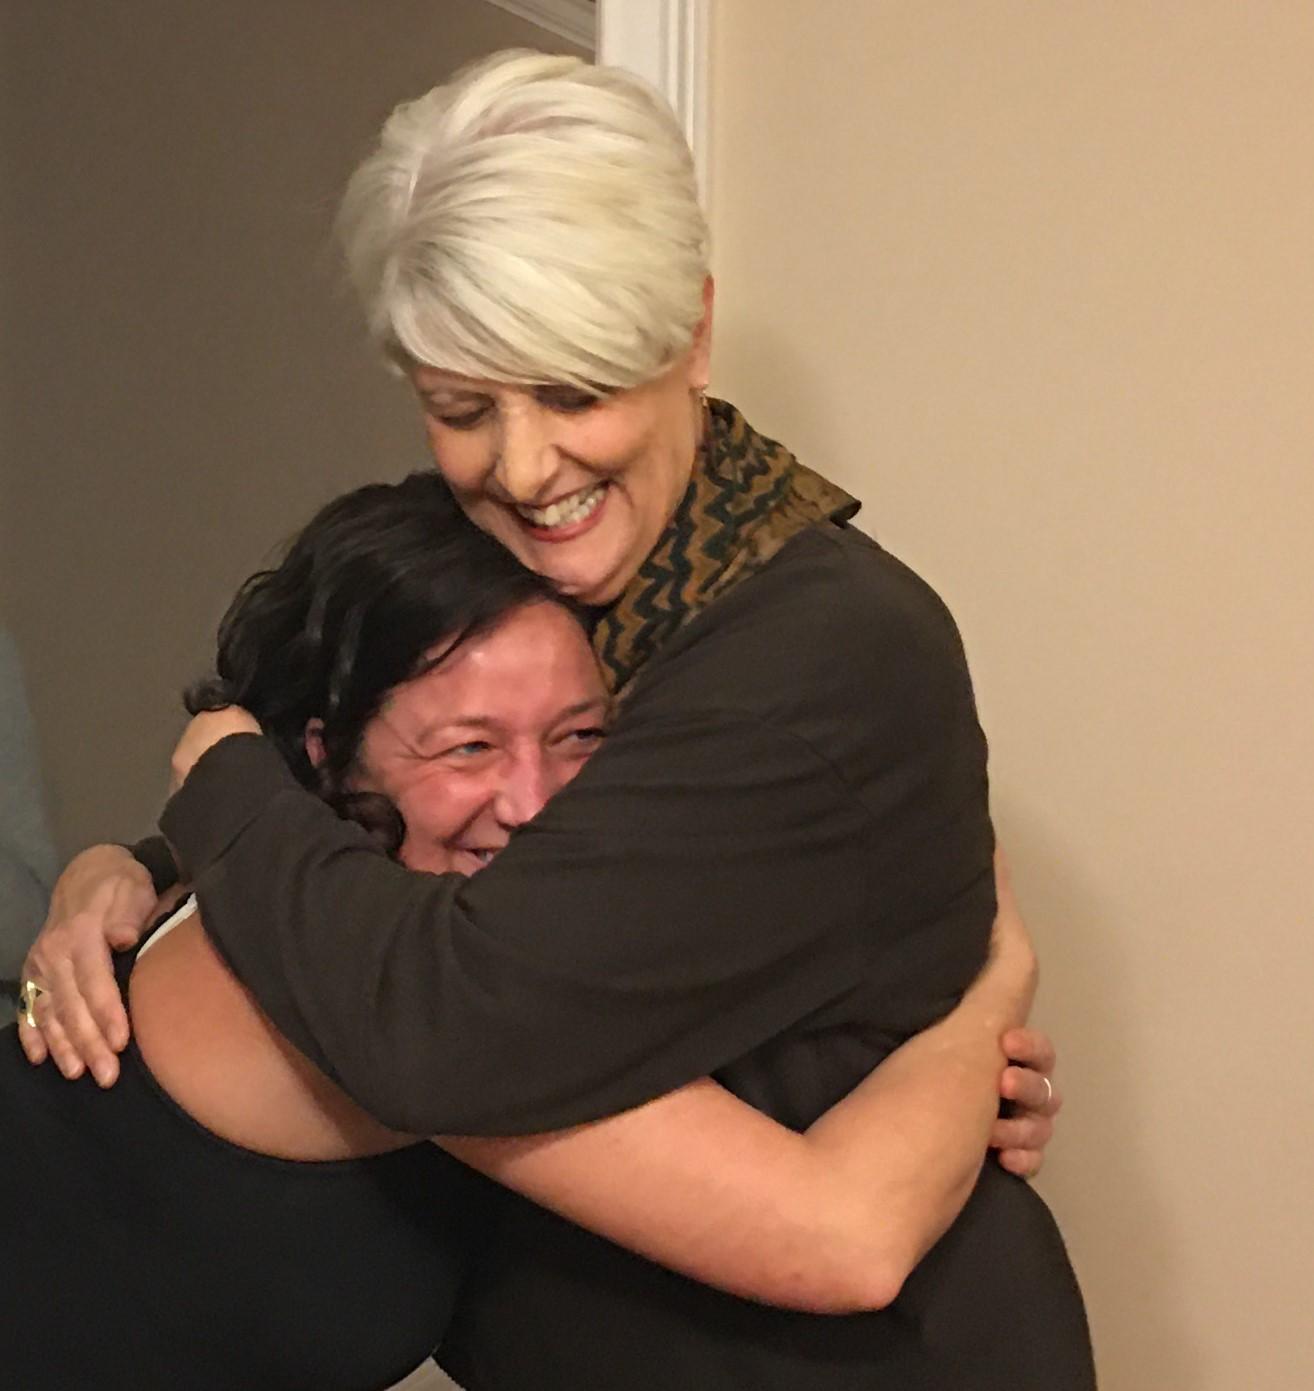 Volunteer Pat Ralls (top) hugs a Healing Housing resident.